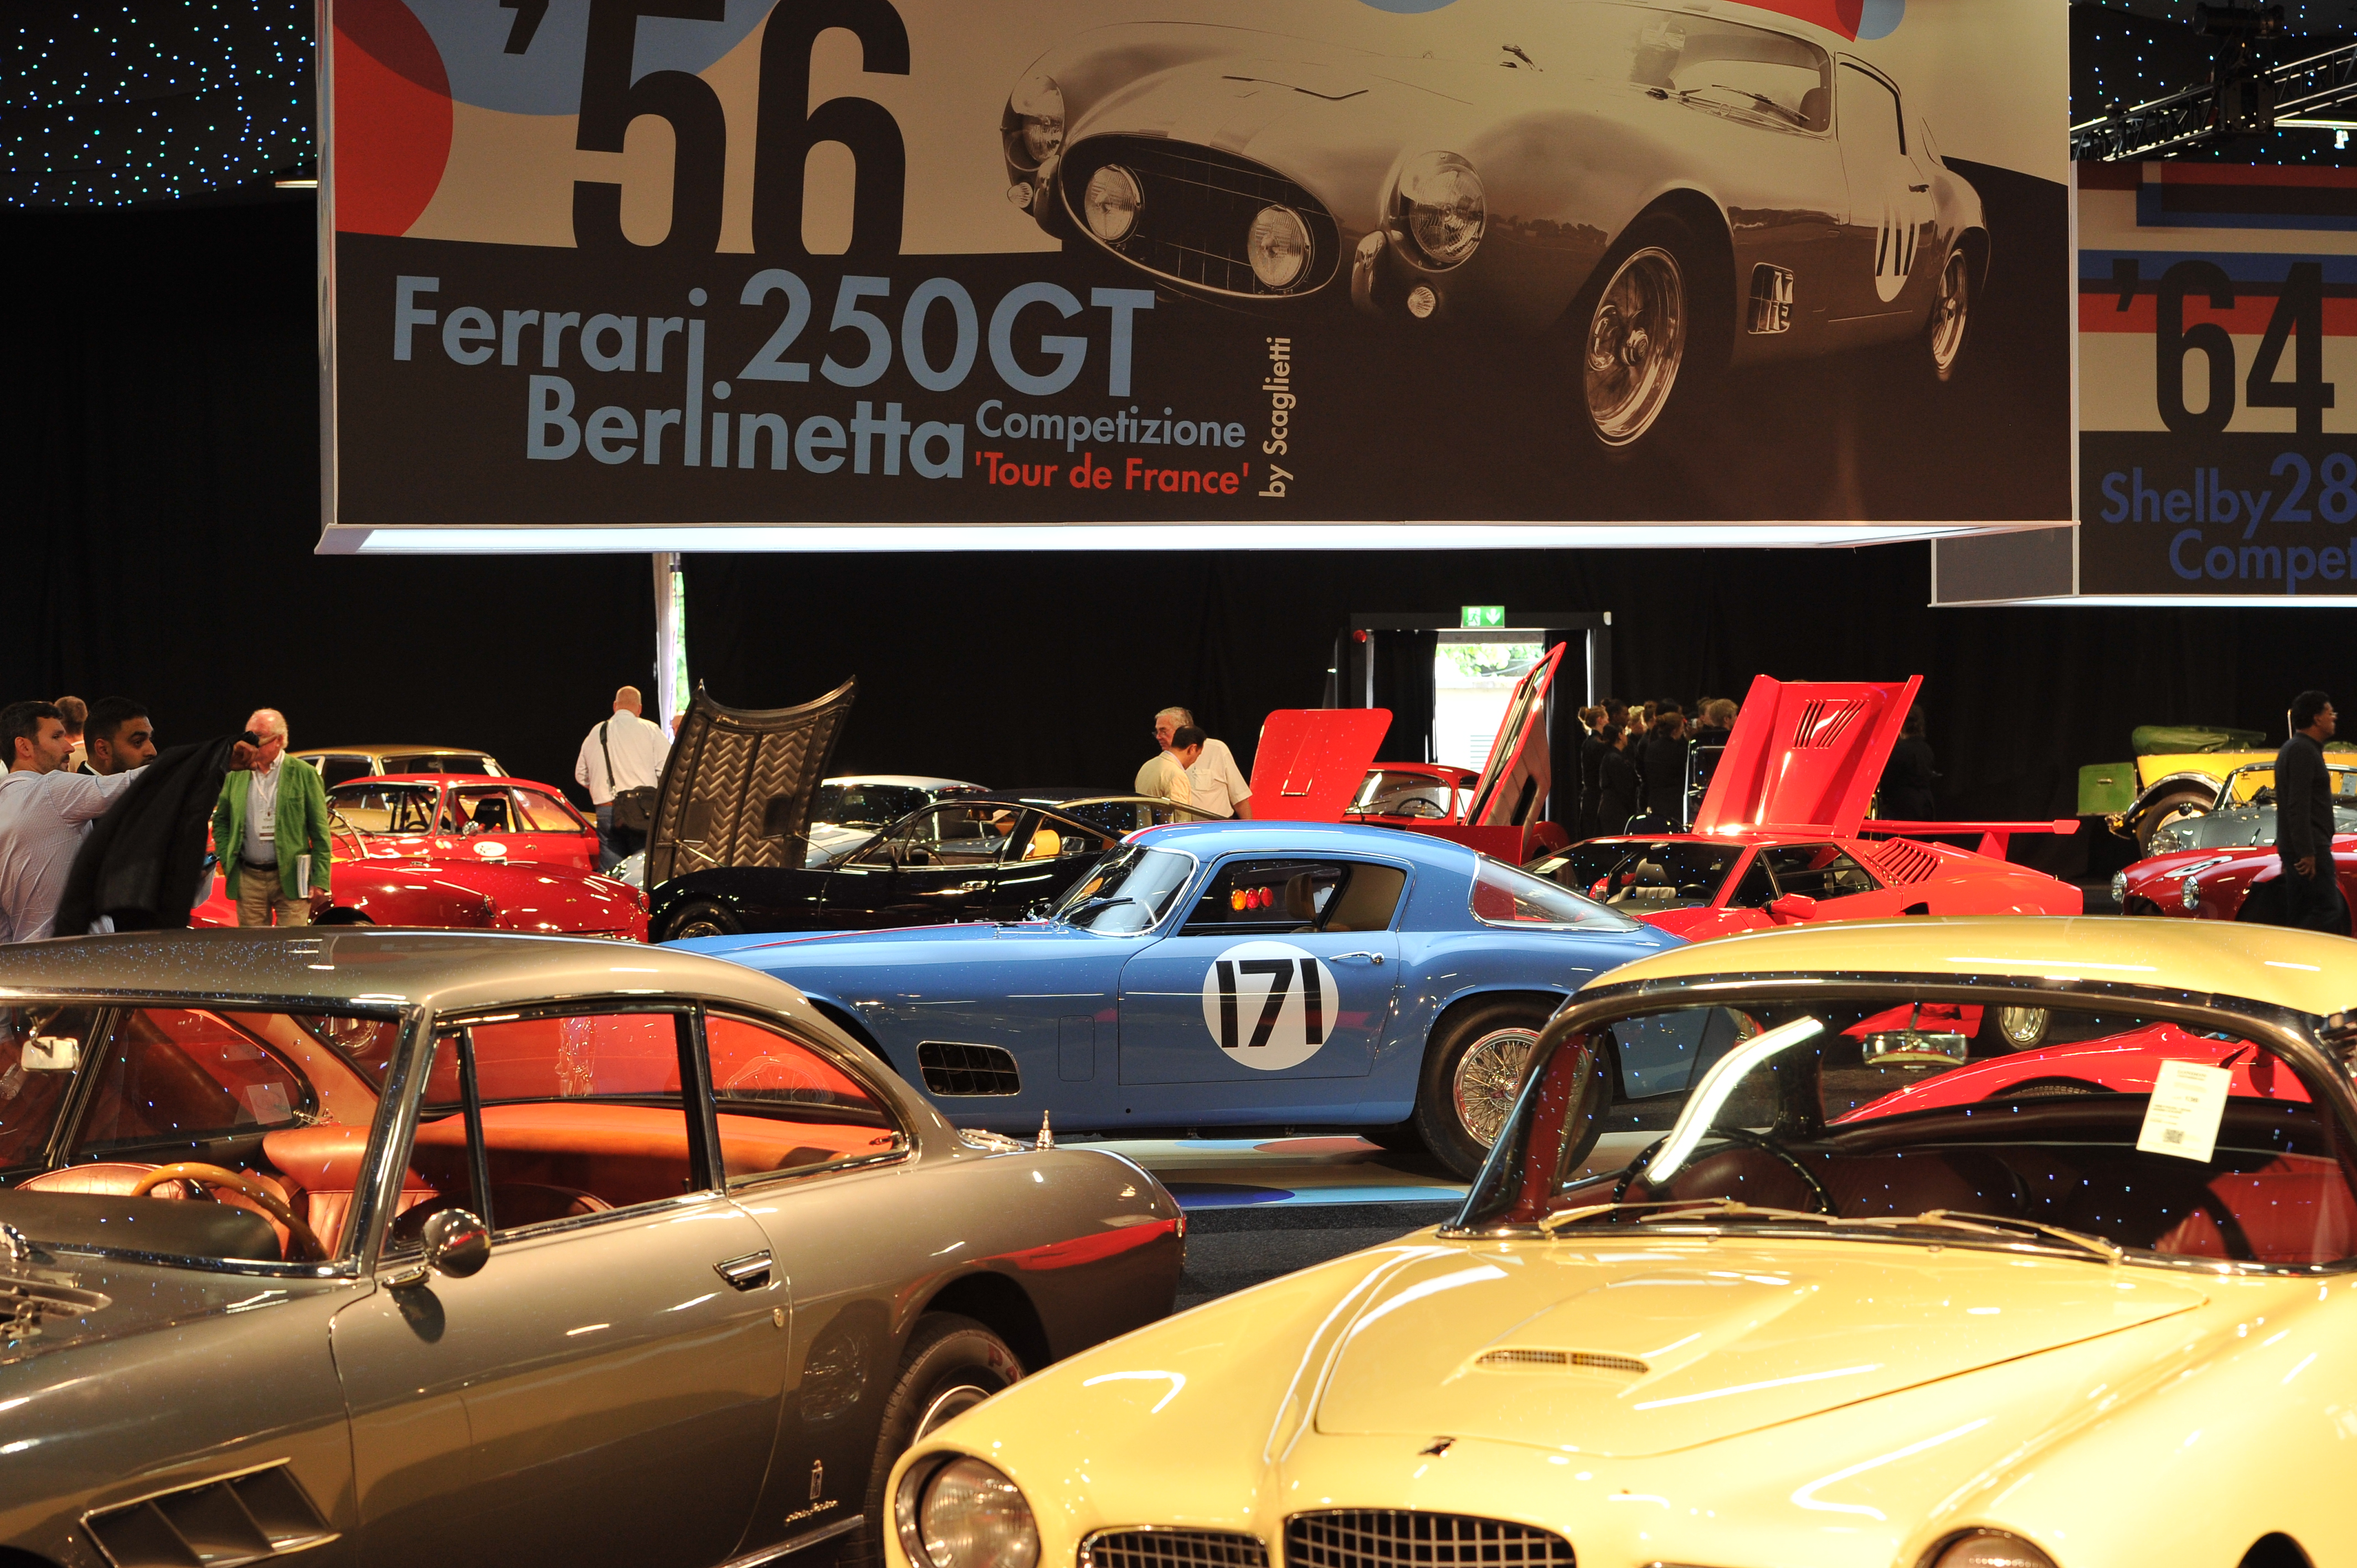 london rm auction mileage ferraris bids condition draw low cars journal fluid tim scott scene